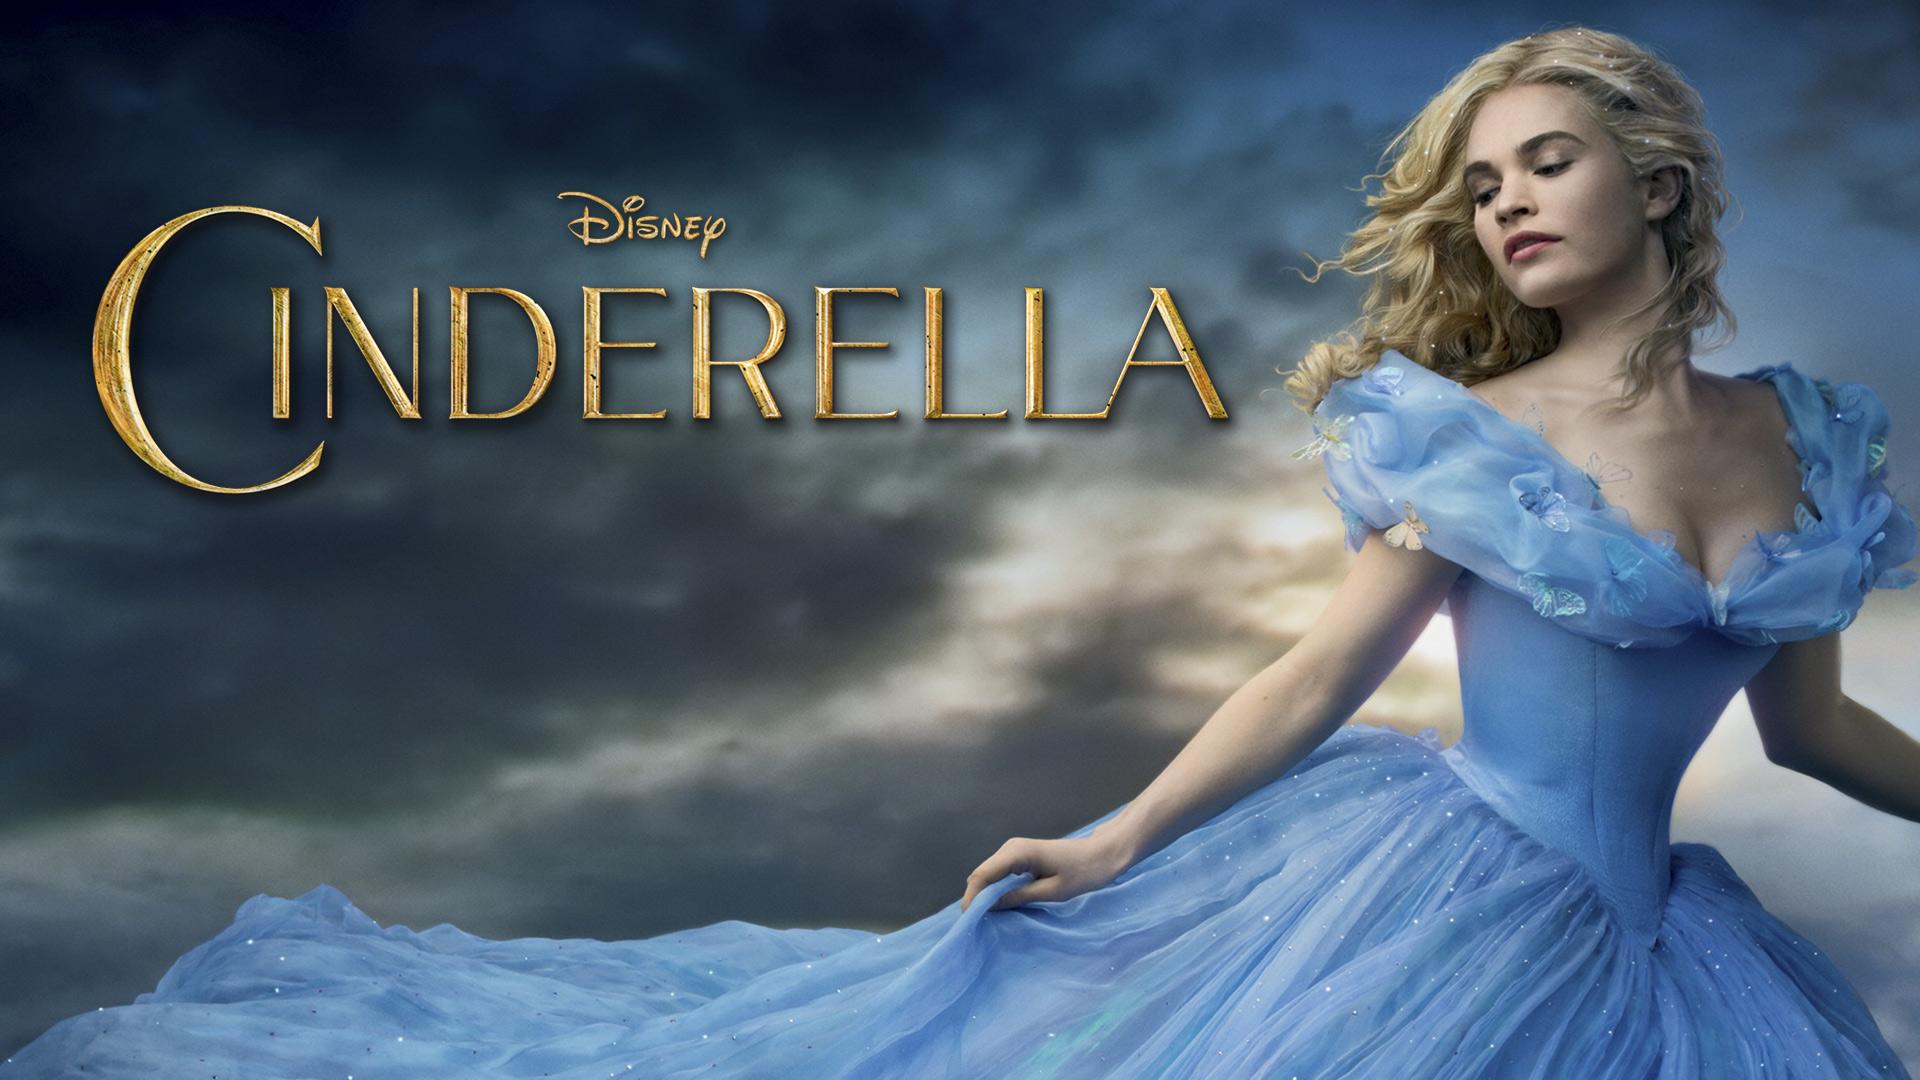 Cinderella (2015) (Theatrical)